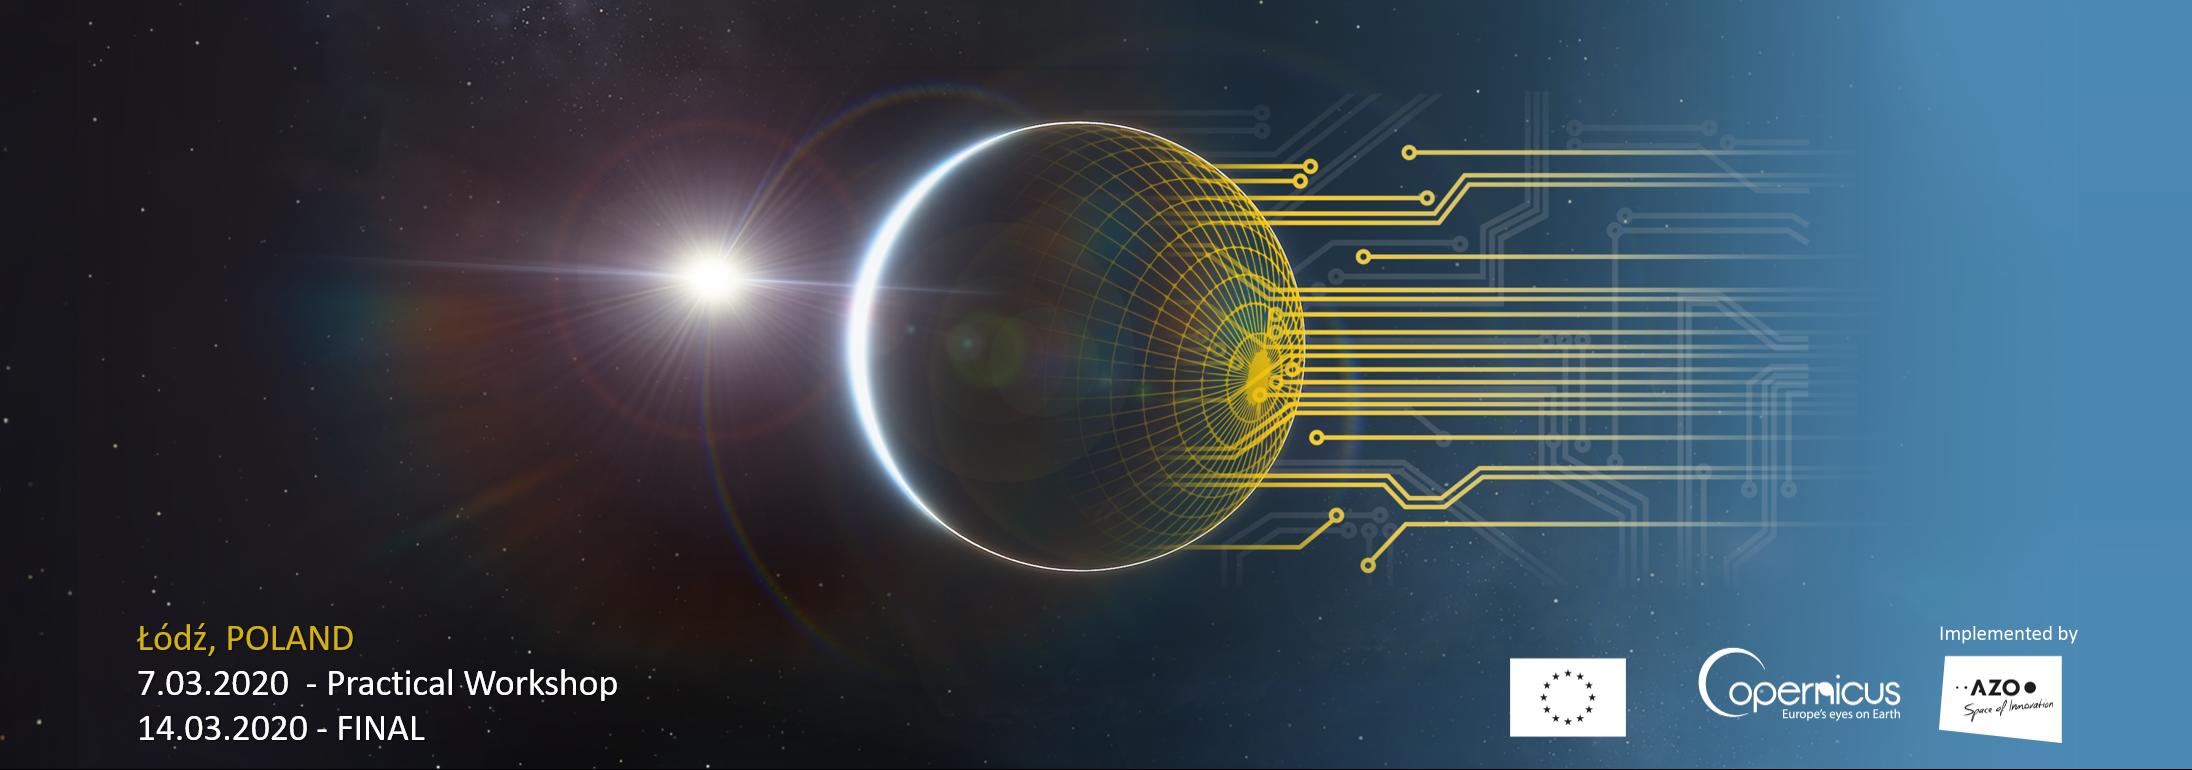 Copernicus Hackathon @ Piotrkowska 148/150